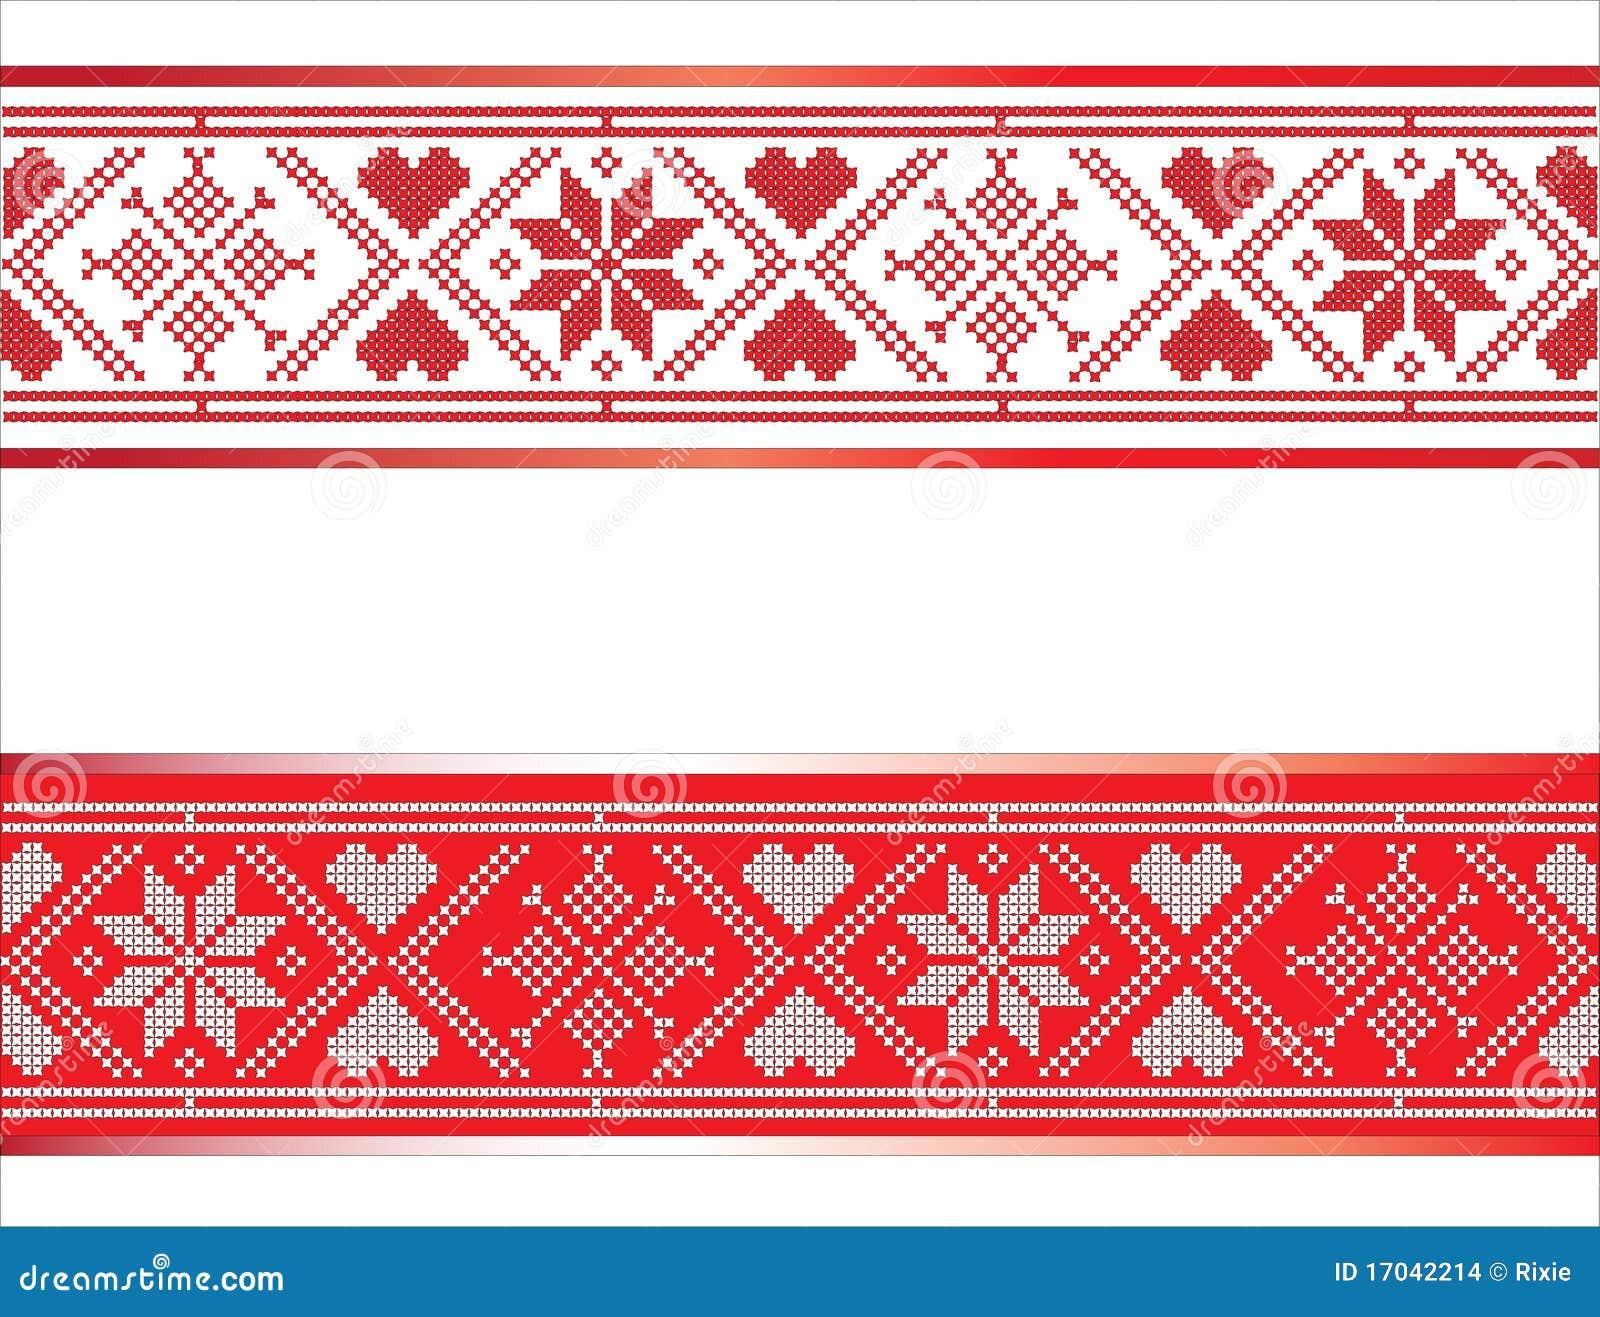 scandinavian ribbon stock images